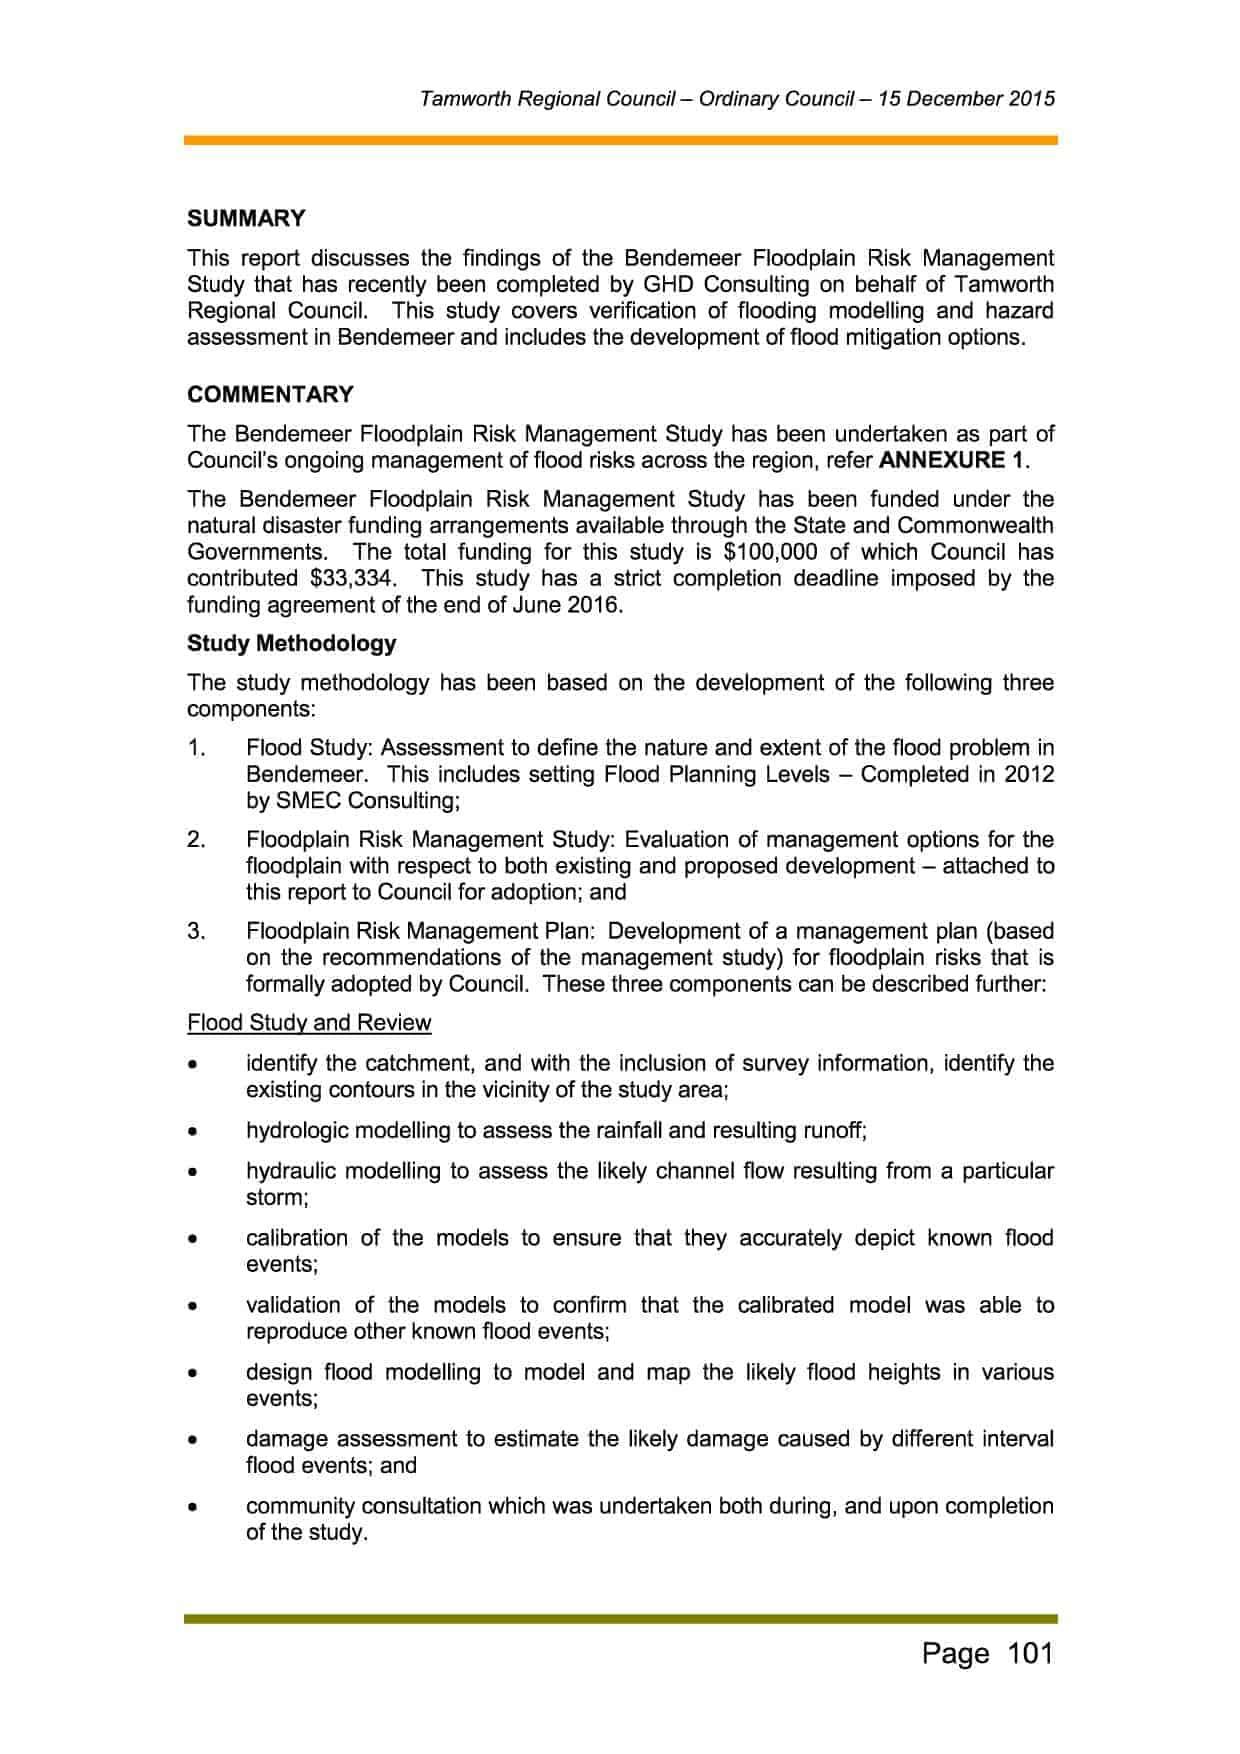 OPEN Business Paper - Ordinary Council 15 December 2015 (1)2